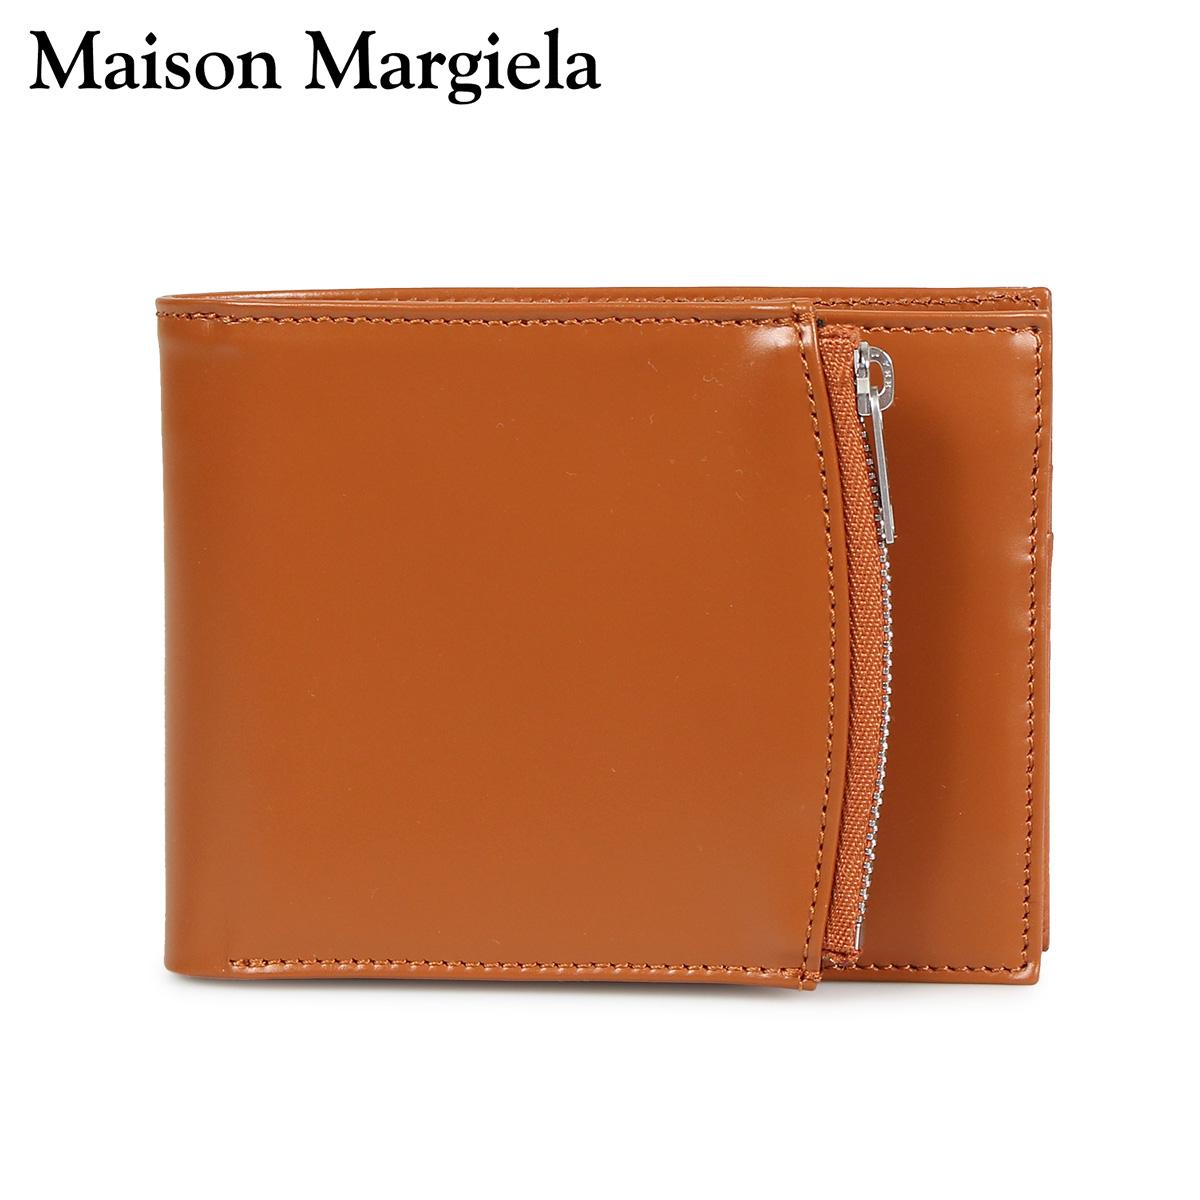 MAISON MARGIELA BI-FOLD WALLET メゾンマルジェラ 財布 二つ折り メンズ レディース レザー ブラウン S35UI0436 P2714